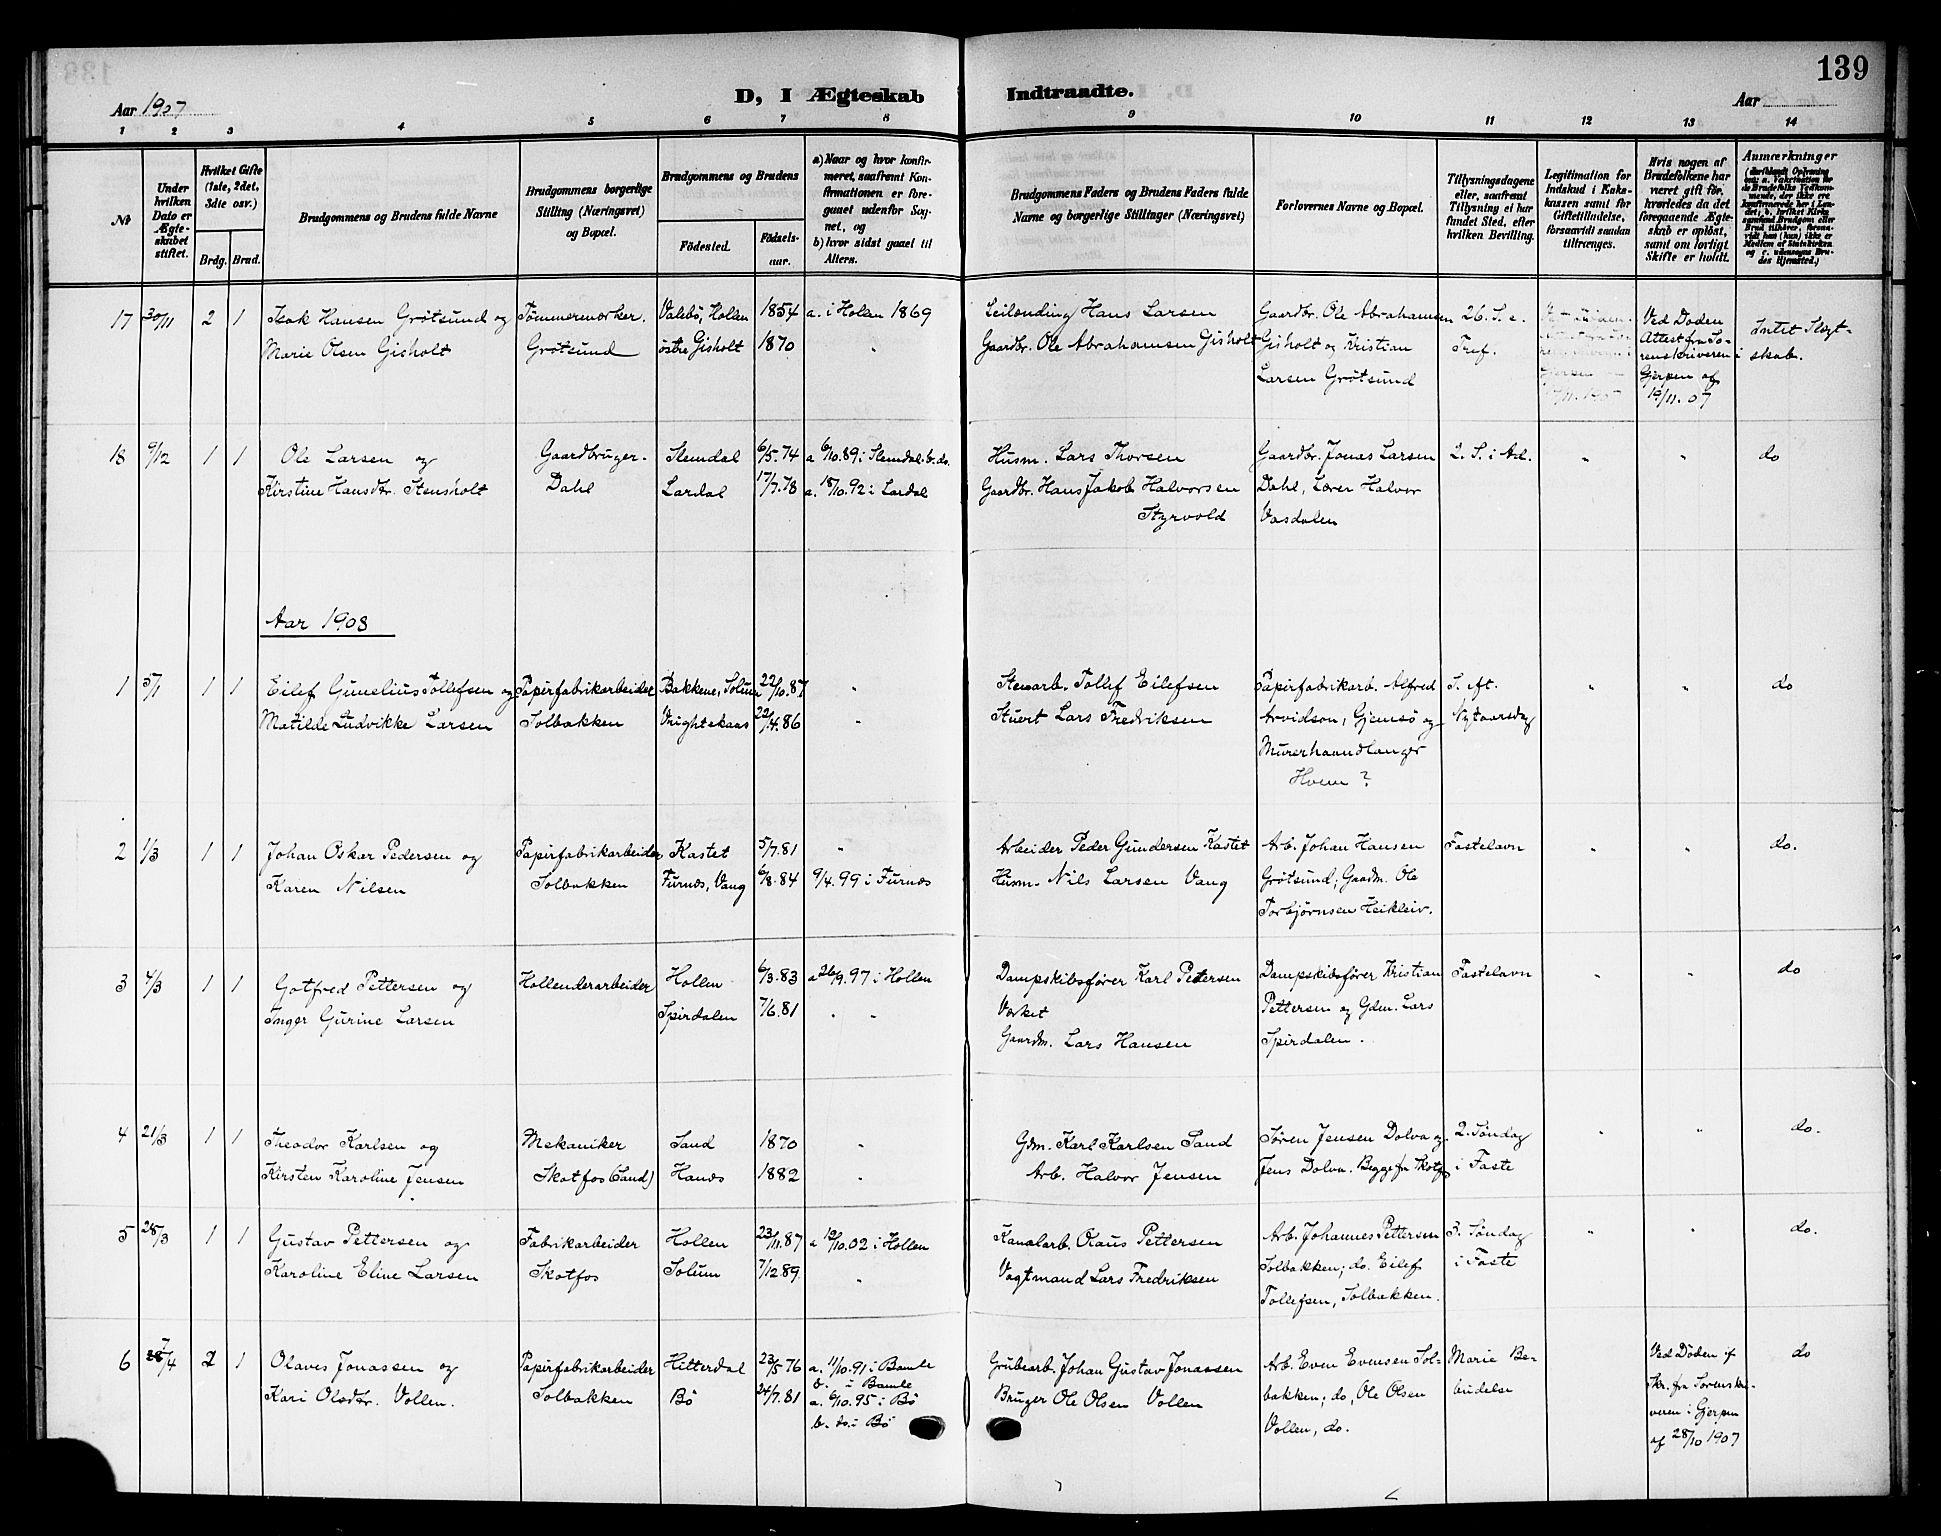 SAKO, Solum kirkebøker, G/Gb/L0005: Klokkerbok nr. II 5, 1905-1914, s. 139